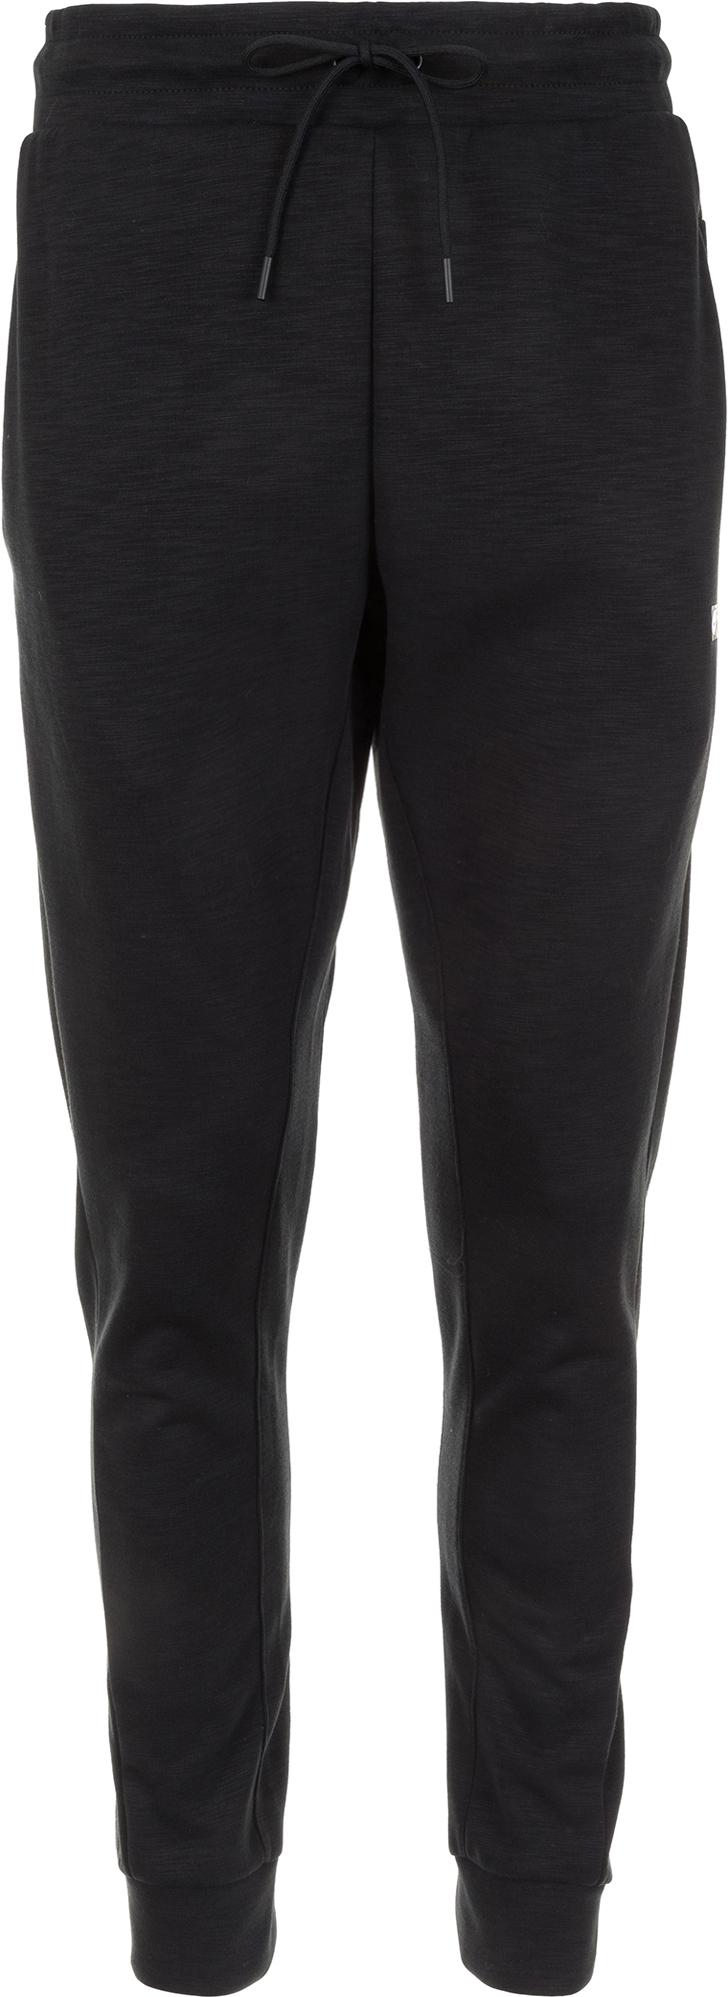 Nike Брюки мужские Sportswear Optic, размер 52-54